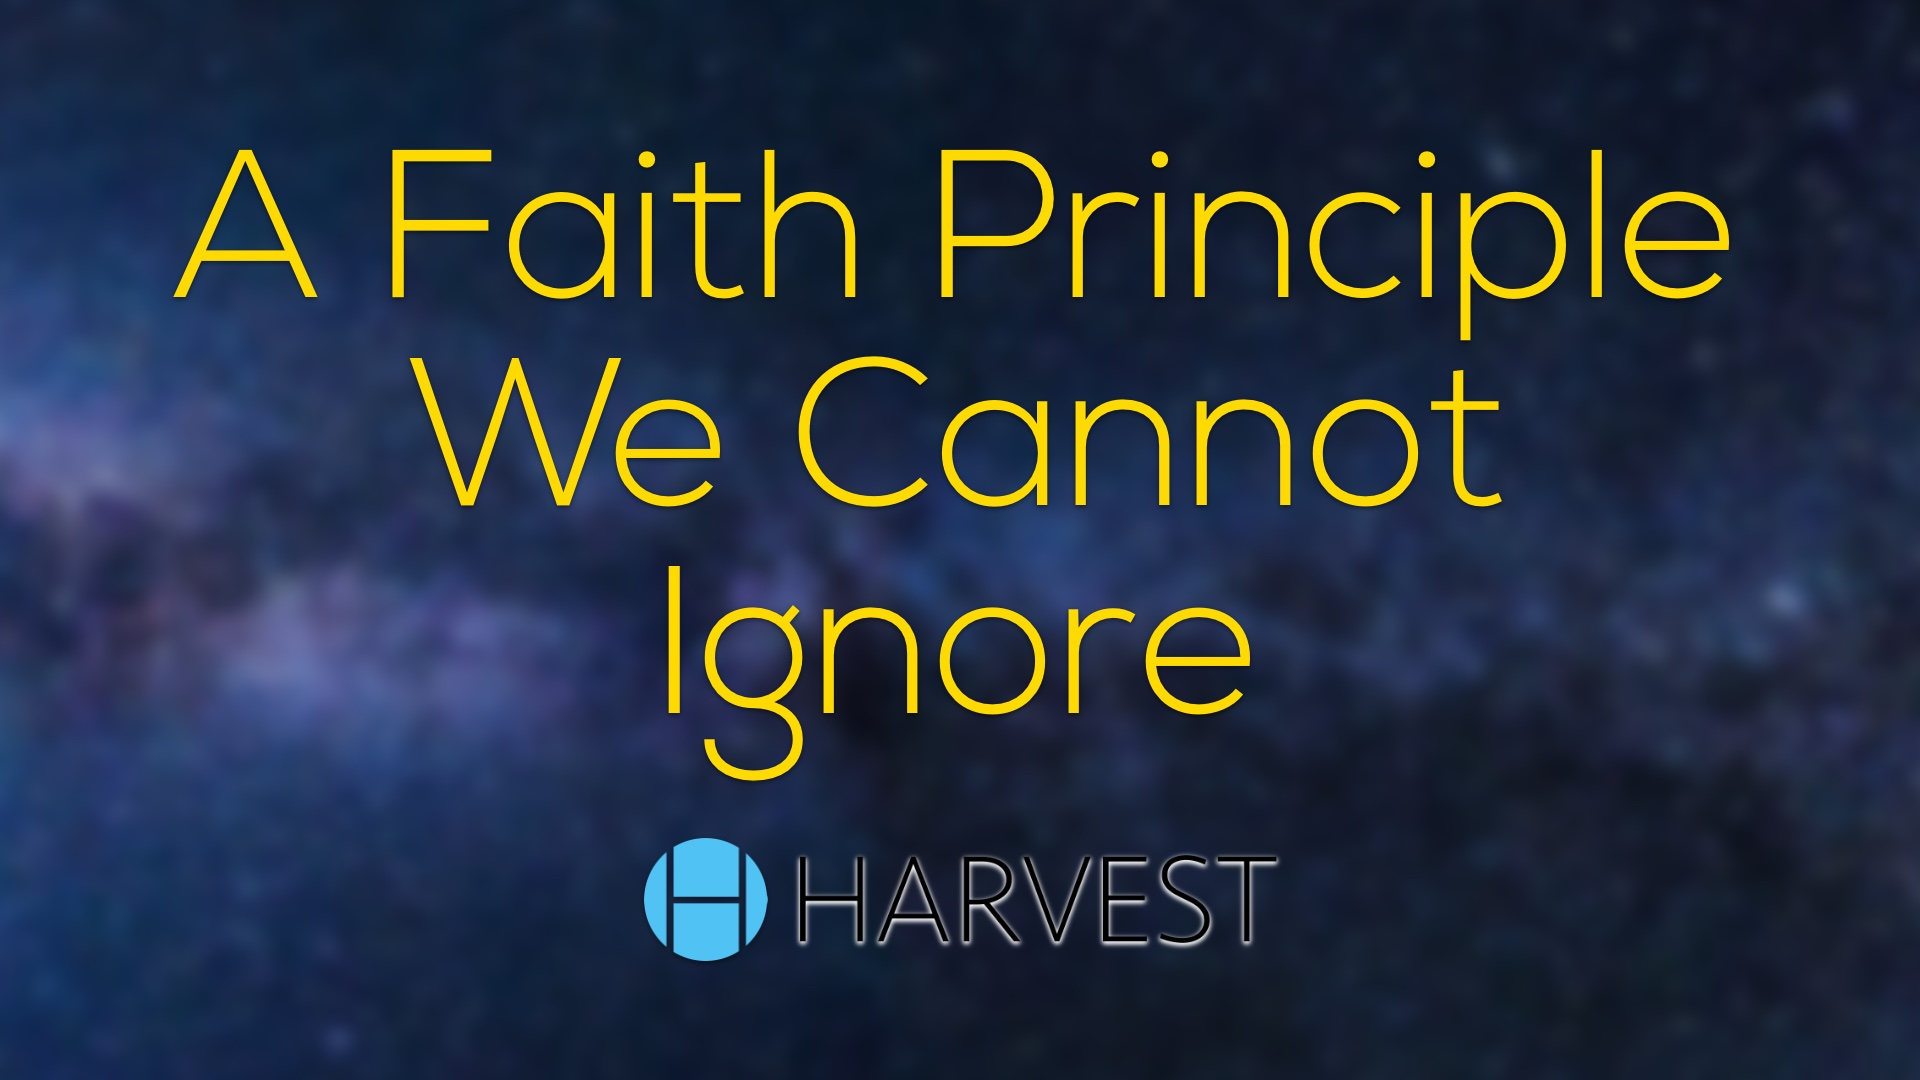 A Faith Principle We Cannot Ignore